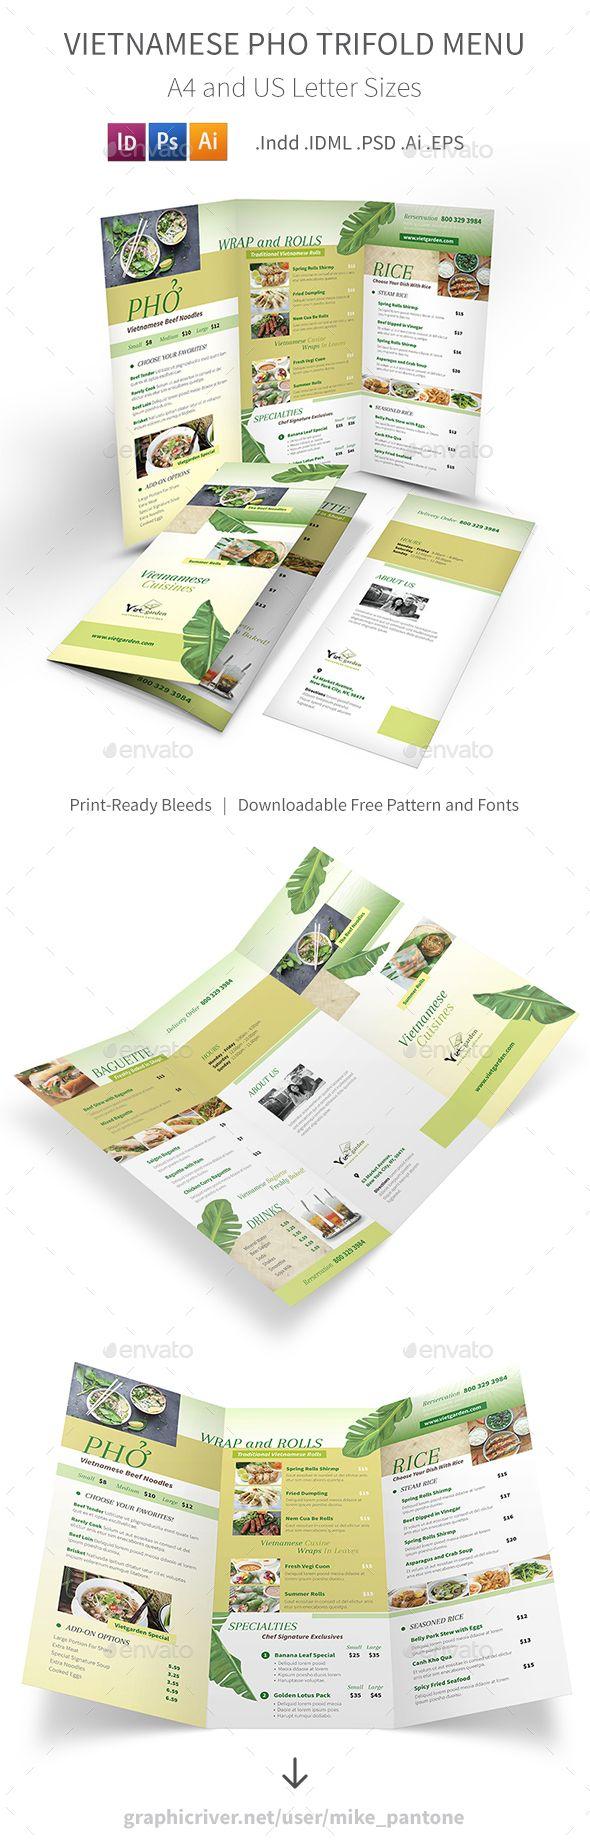 Vietnamese Pho Trifold Menu 3 — Photoshop PSD #pho #eastern • Download ➝ https://graphicriver.net/item/vietnamese-pho-trifold-menu-3/20288598?ref=pxcr